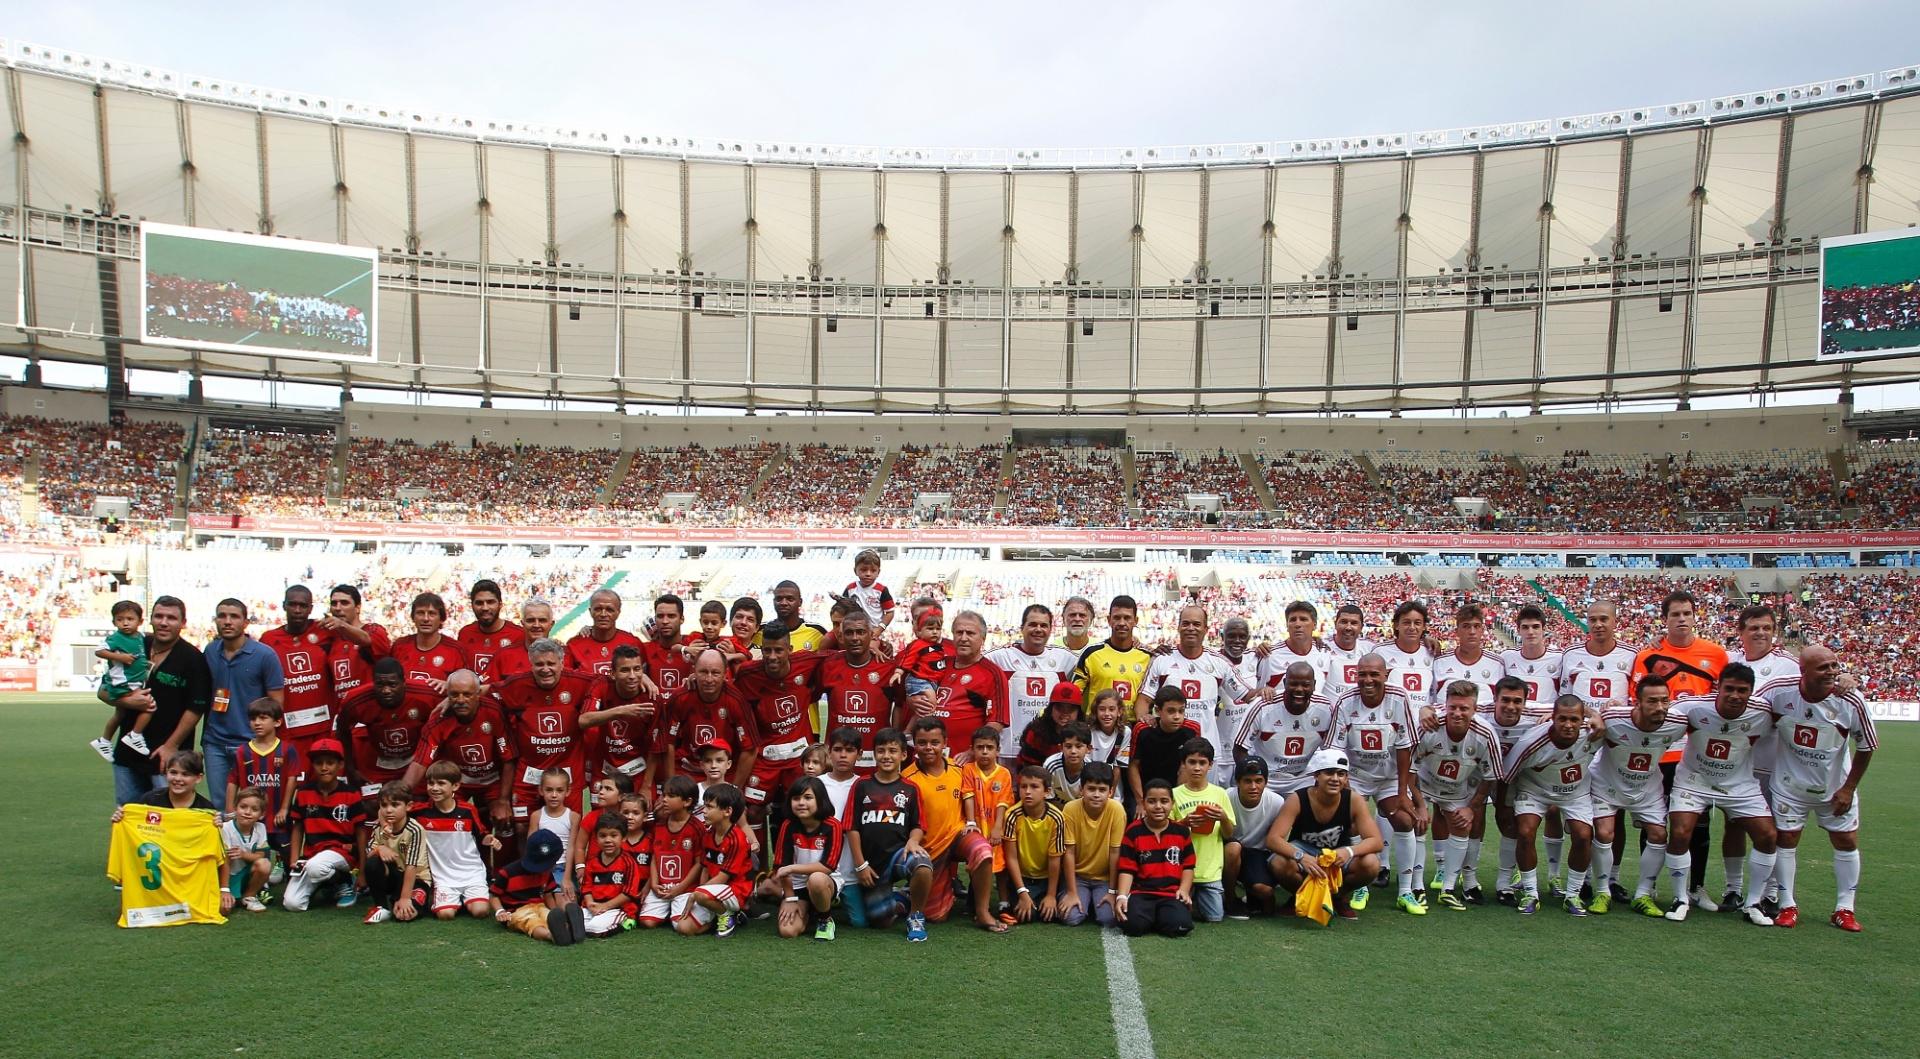 28.dez.2013 - Zico recebe amigos e atletas para o Jogo das Estrelas, no Maracanã